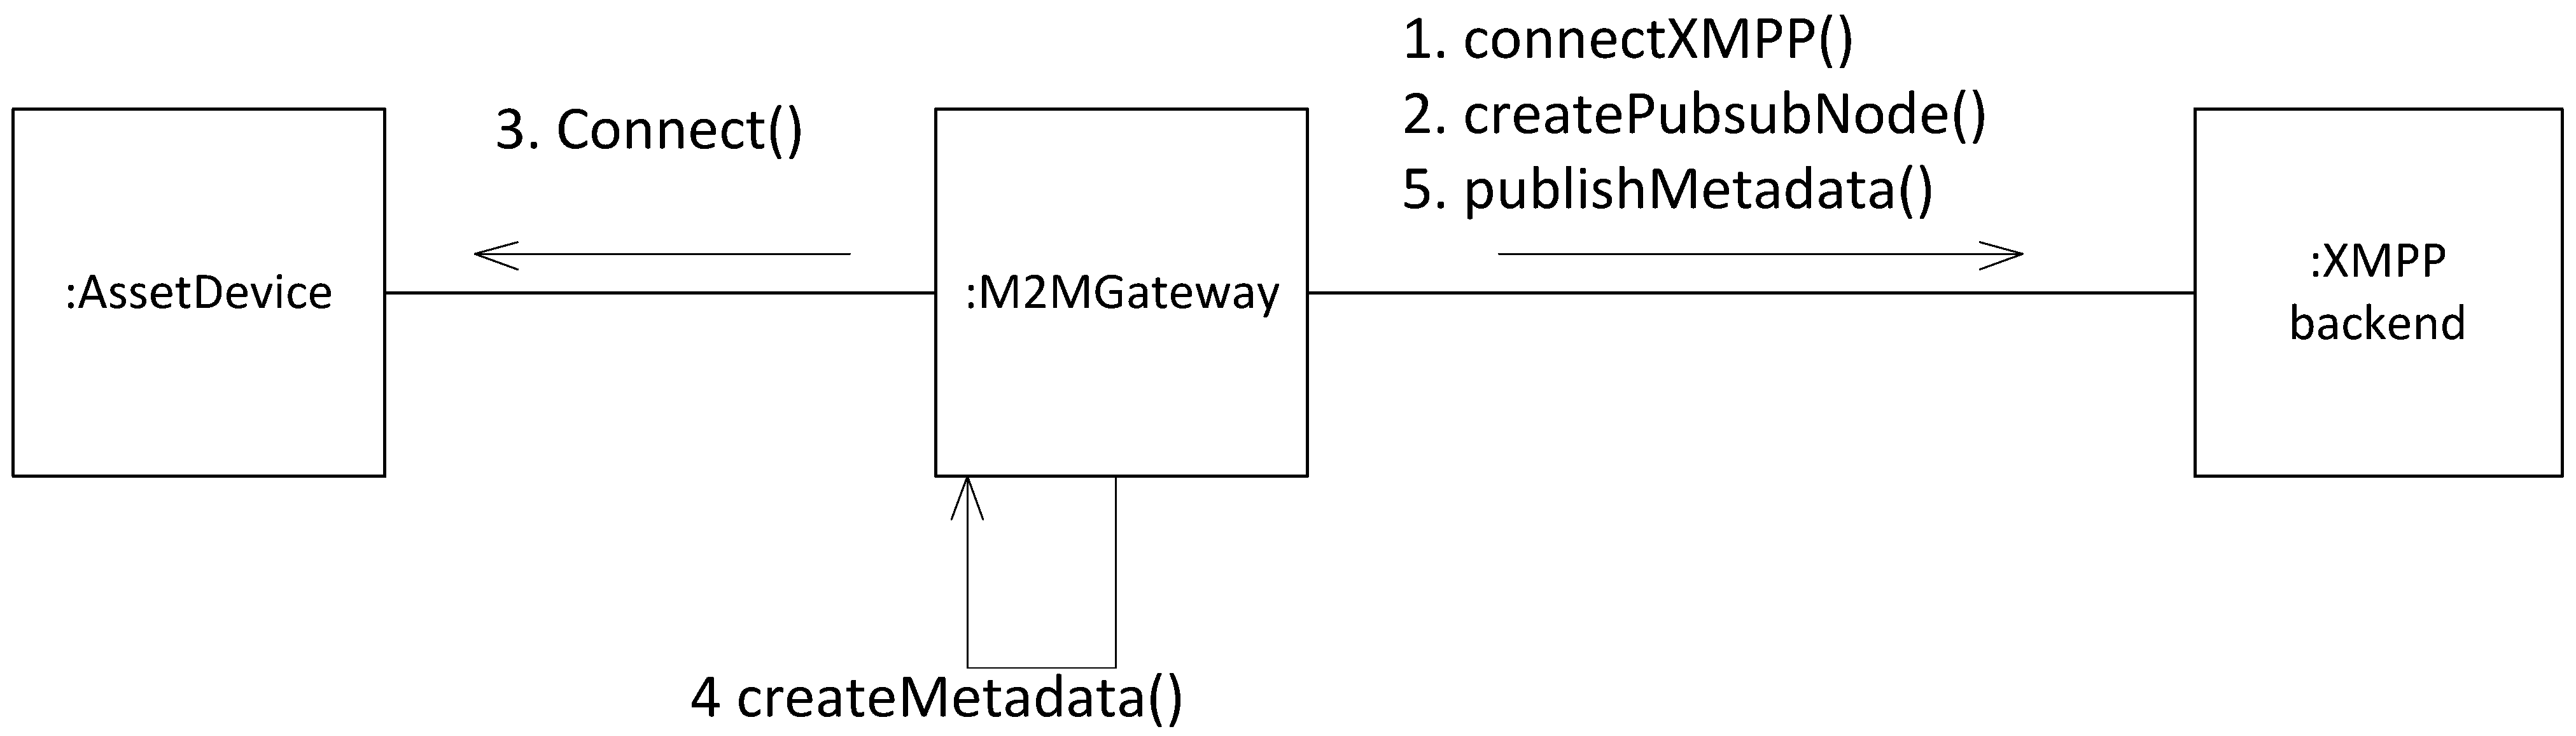 Future Internet Free Full Text Towards Horizontal Architecture Network Diagram For Internetbased Servers Scenario 4 With Futureinternet 06 00261 G026 1024